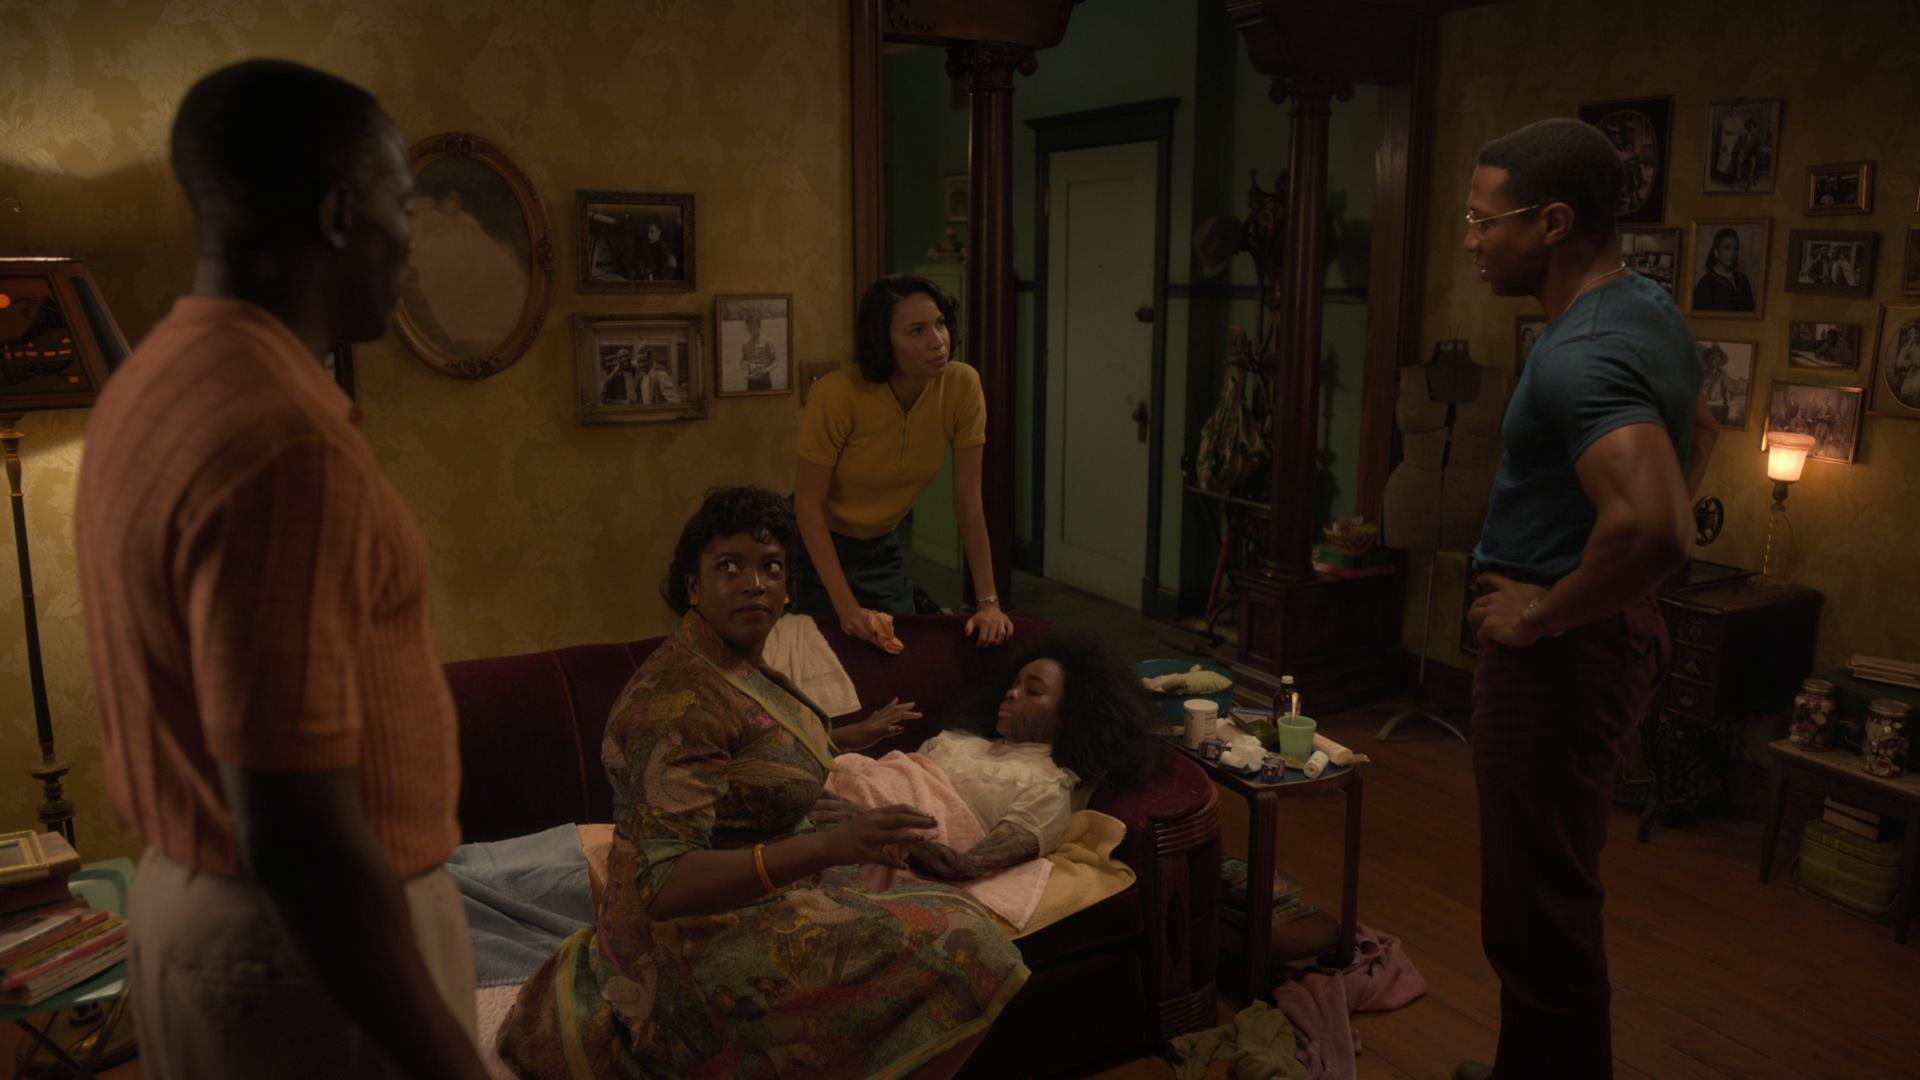 Wunmi Mosaku, Jada Harris, Jurnee Smollett, Jonathan Majors HBO Lovecraft Country Season 1 - Episode 9